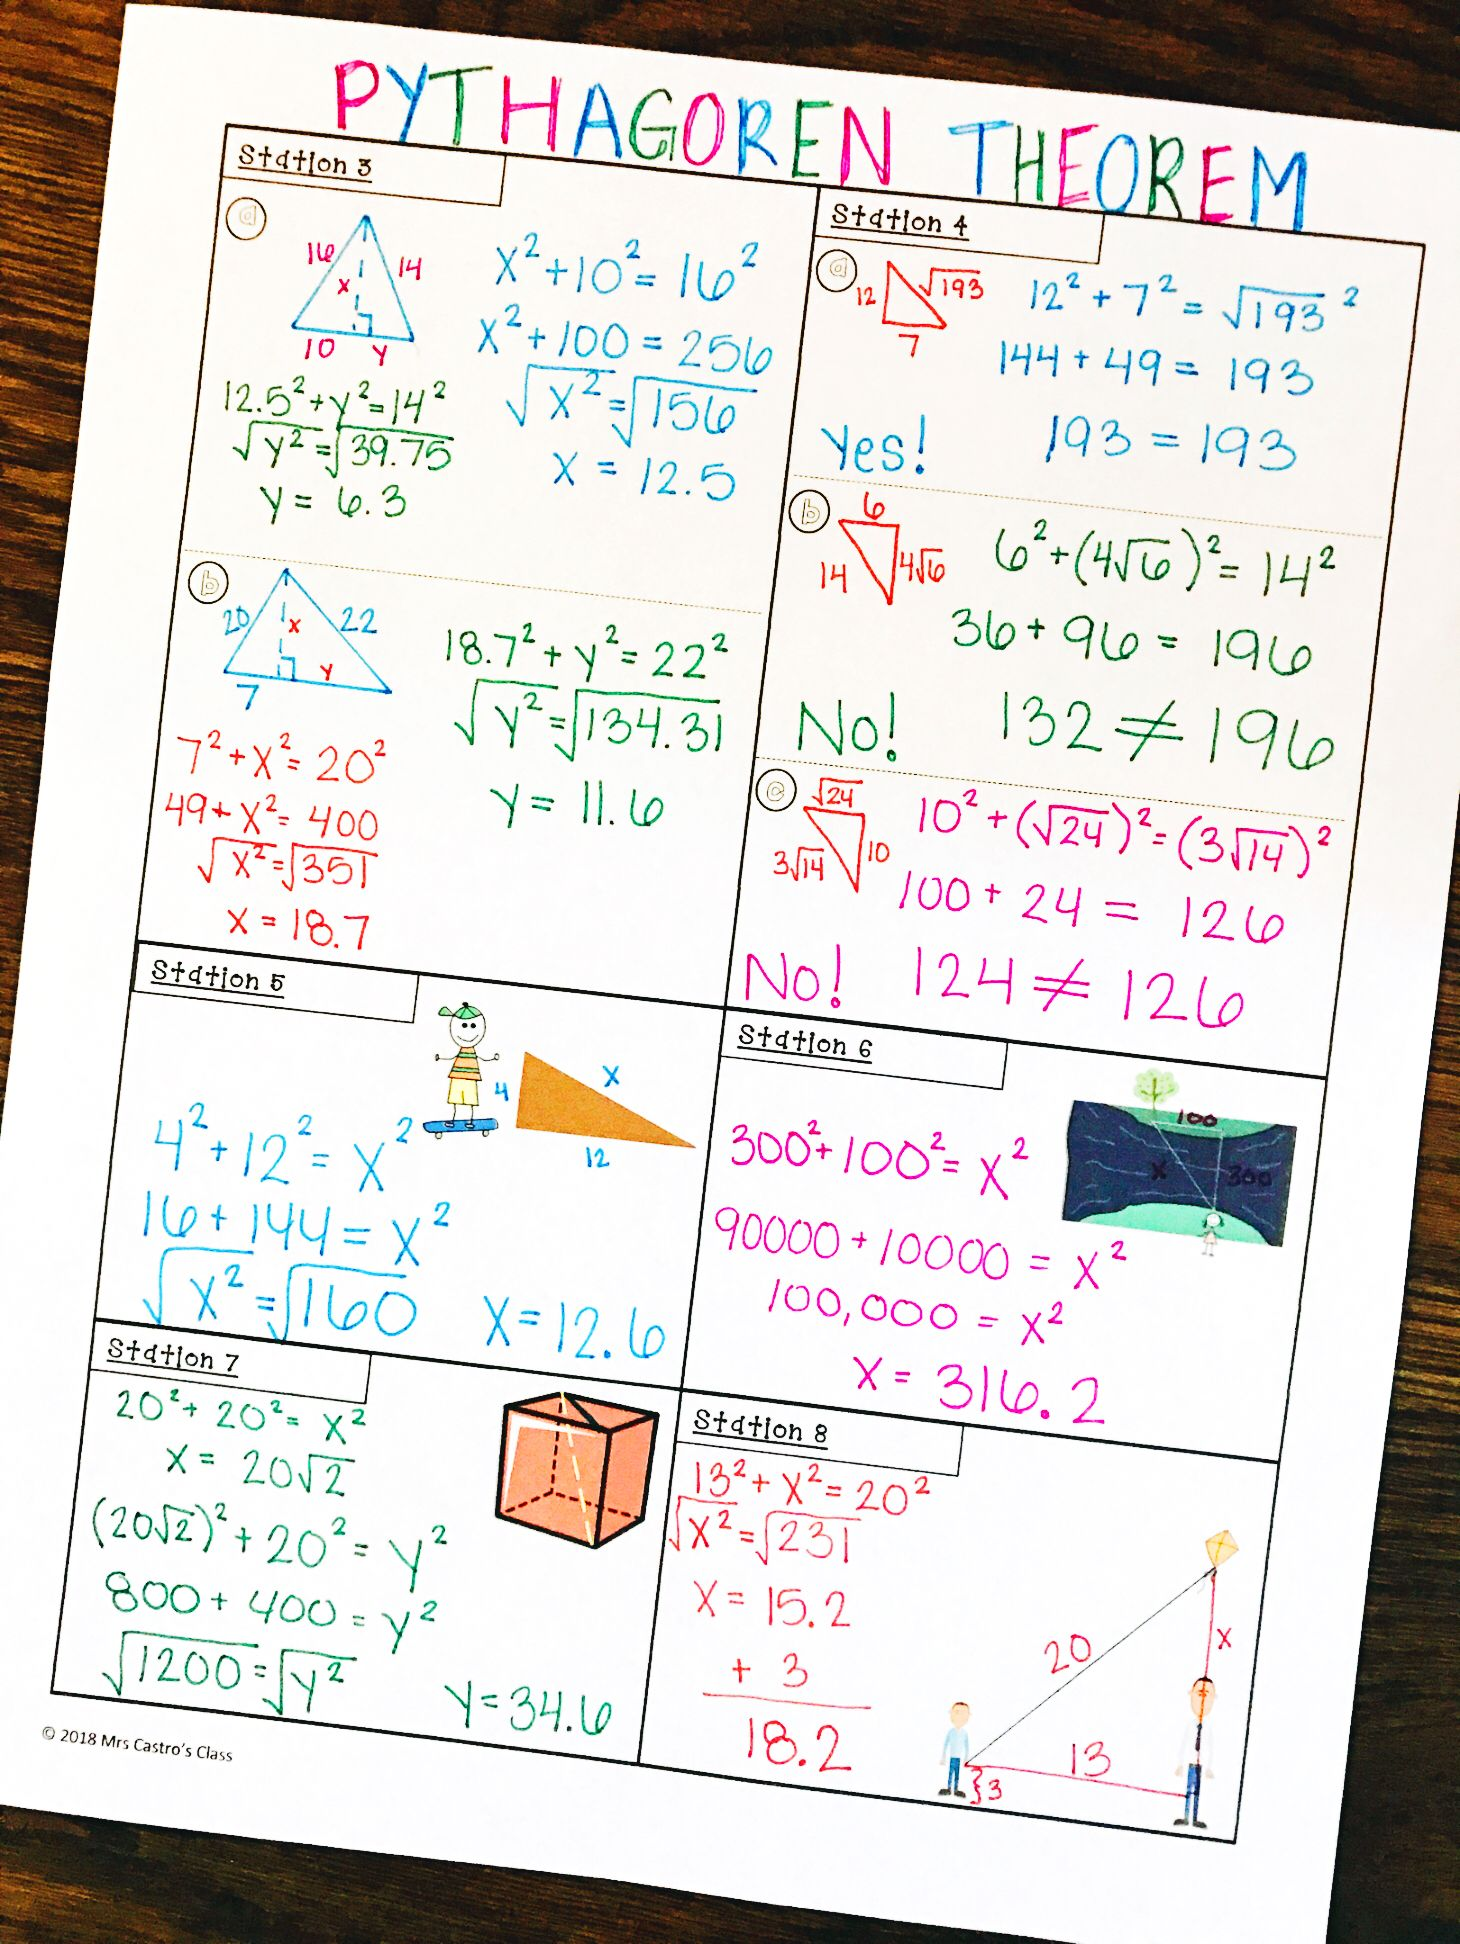 Pythagorean Theorem Stations Activity Pythagorean Theorem Theorems Word Problem Worksheets [ 1944 x 1460 Pixel ]